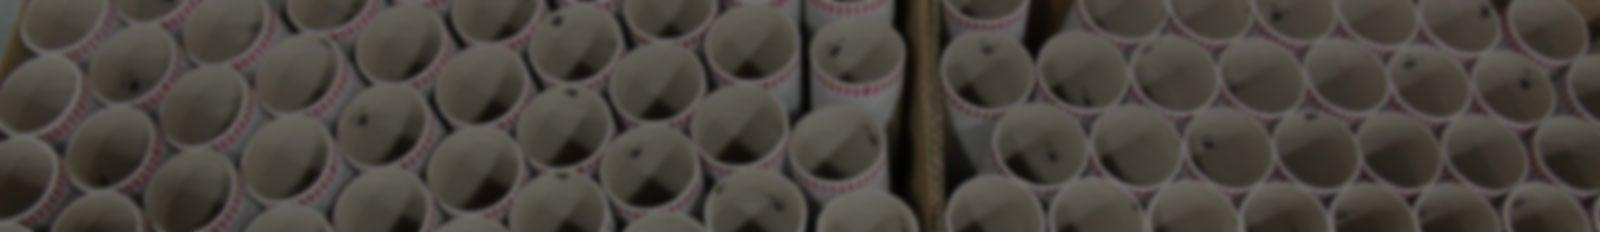 Tubes-in-boxes-slice.jpg